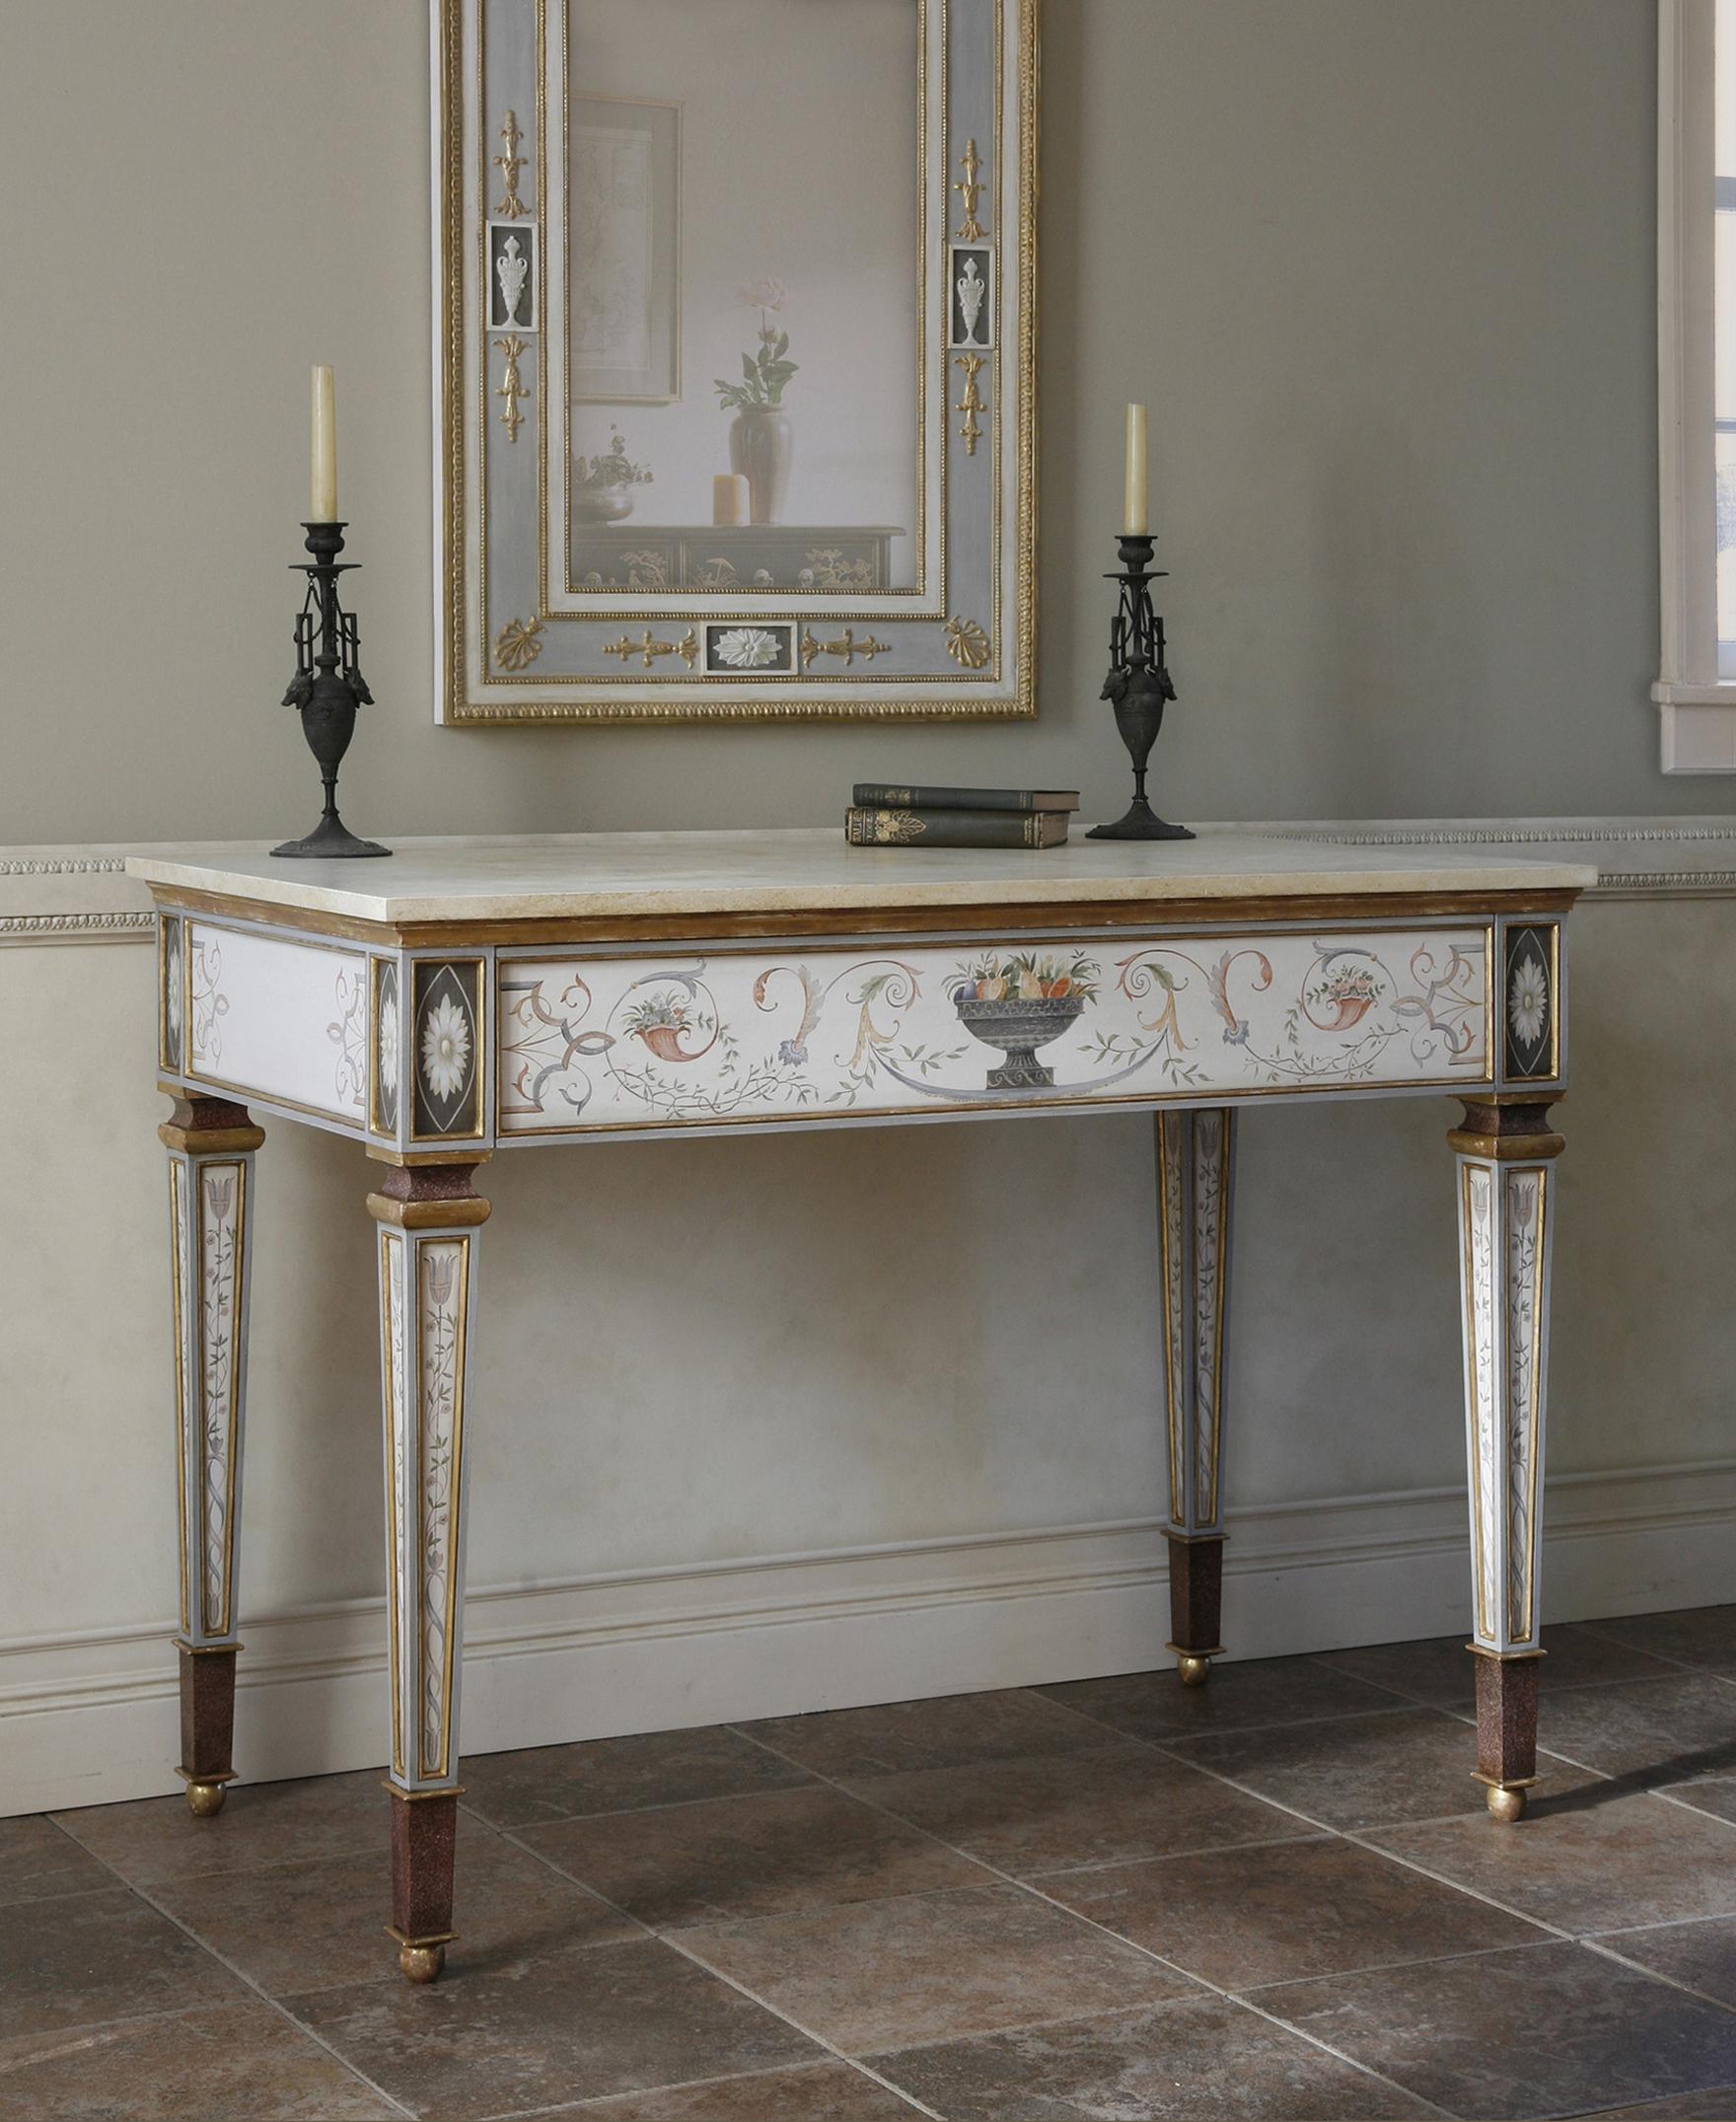 Italian Neoclassical Tables